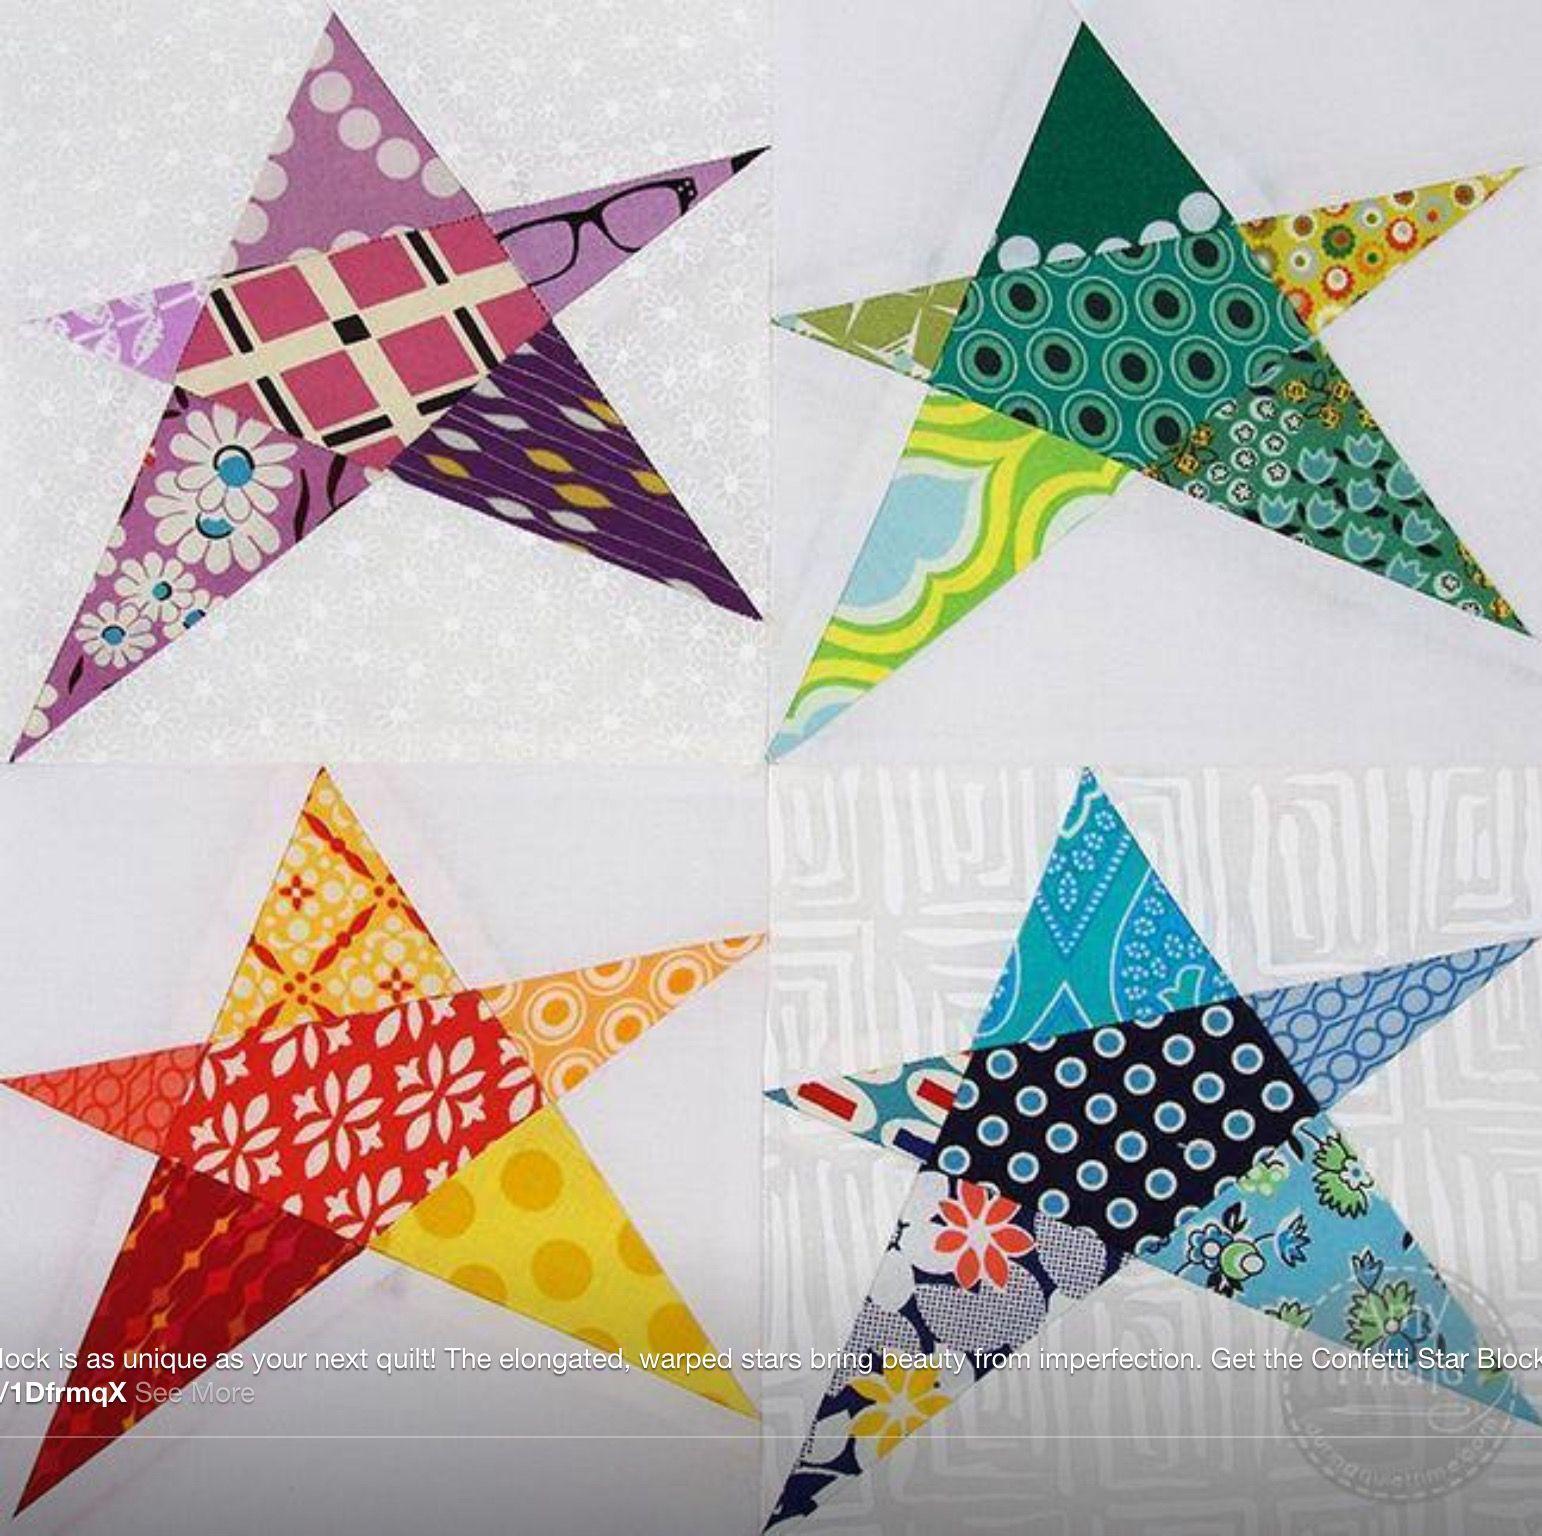 Crazy stars | crazy quilt patterns | Pinterest | Star, Star quilts ... : crazy star quilt pattern - Adamdwight.com